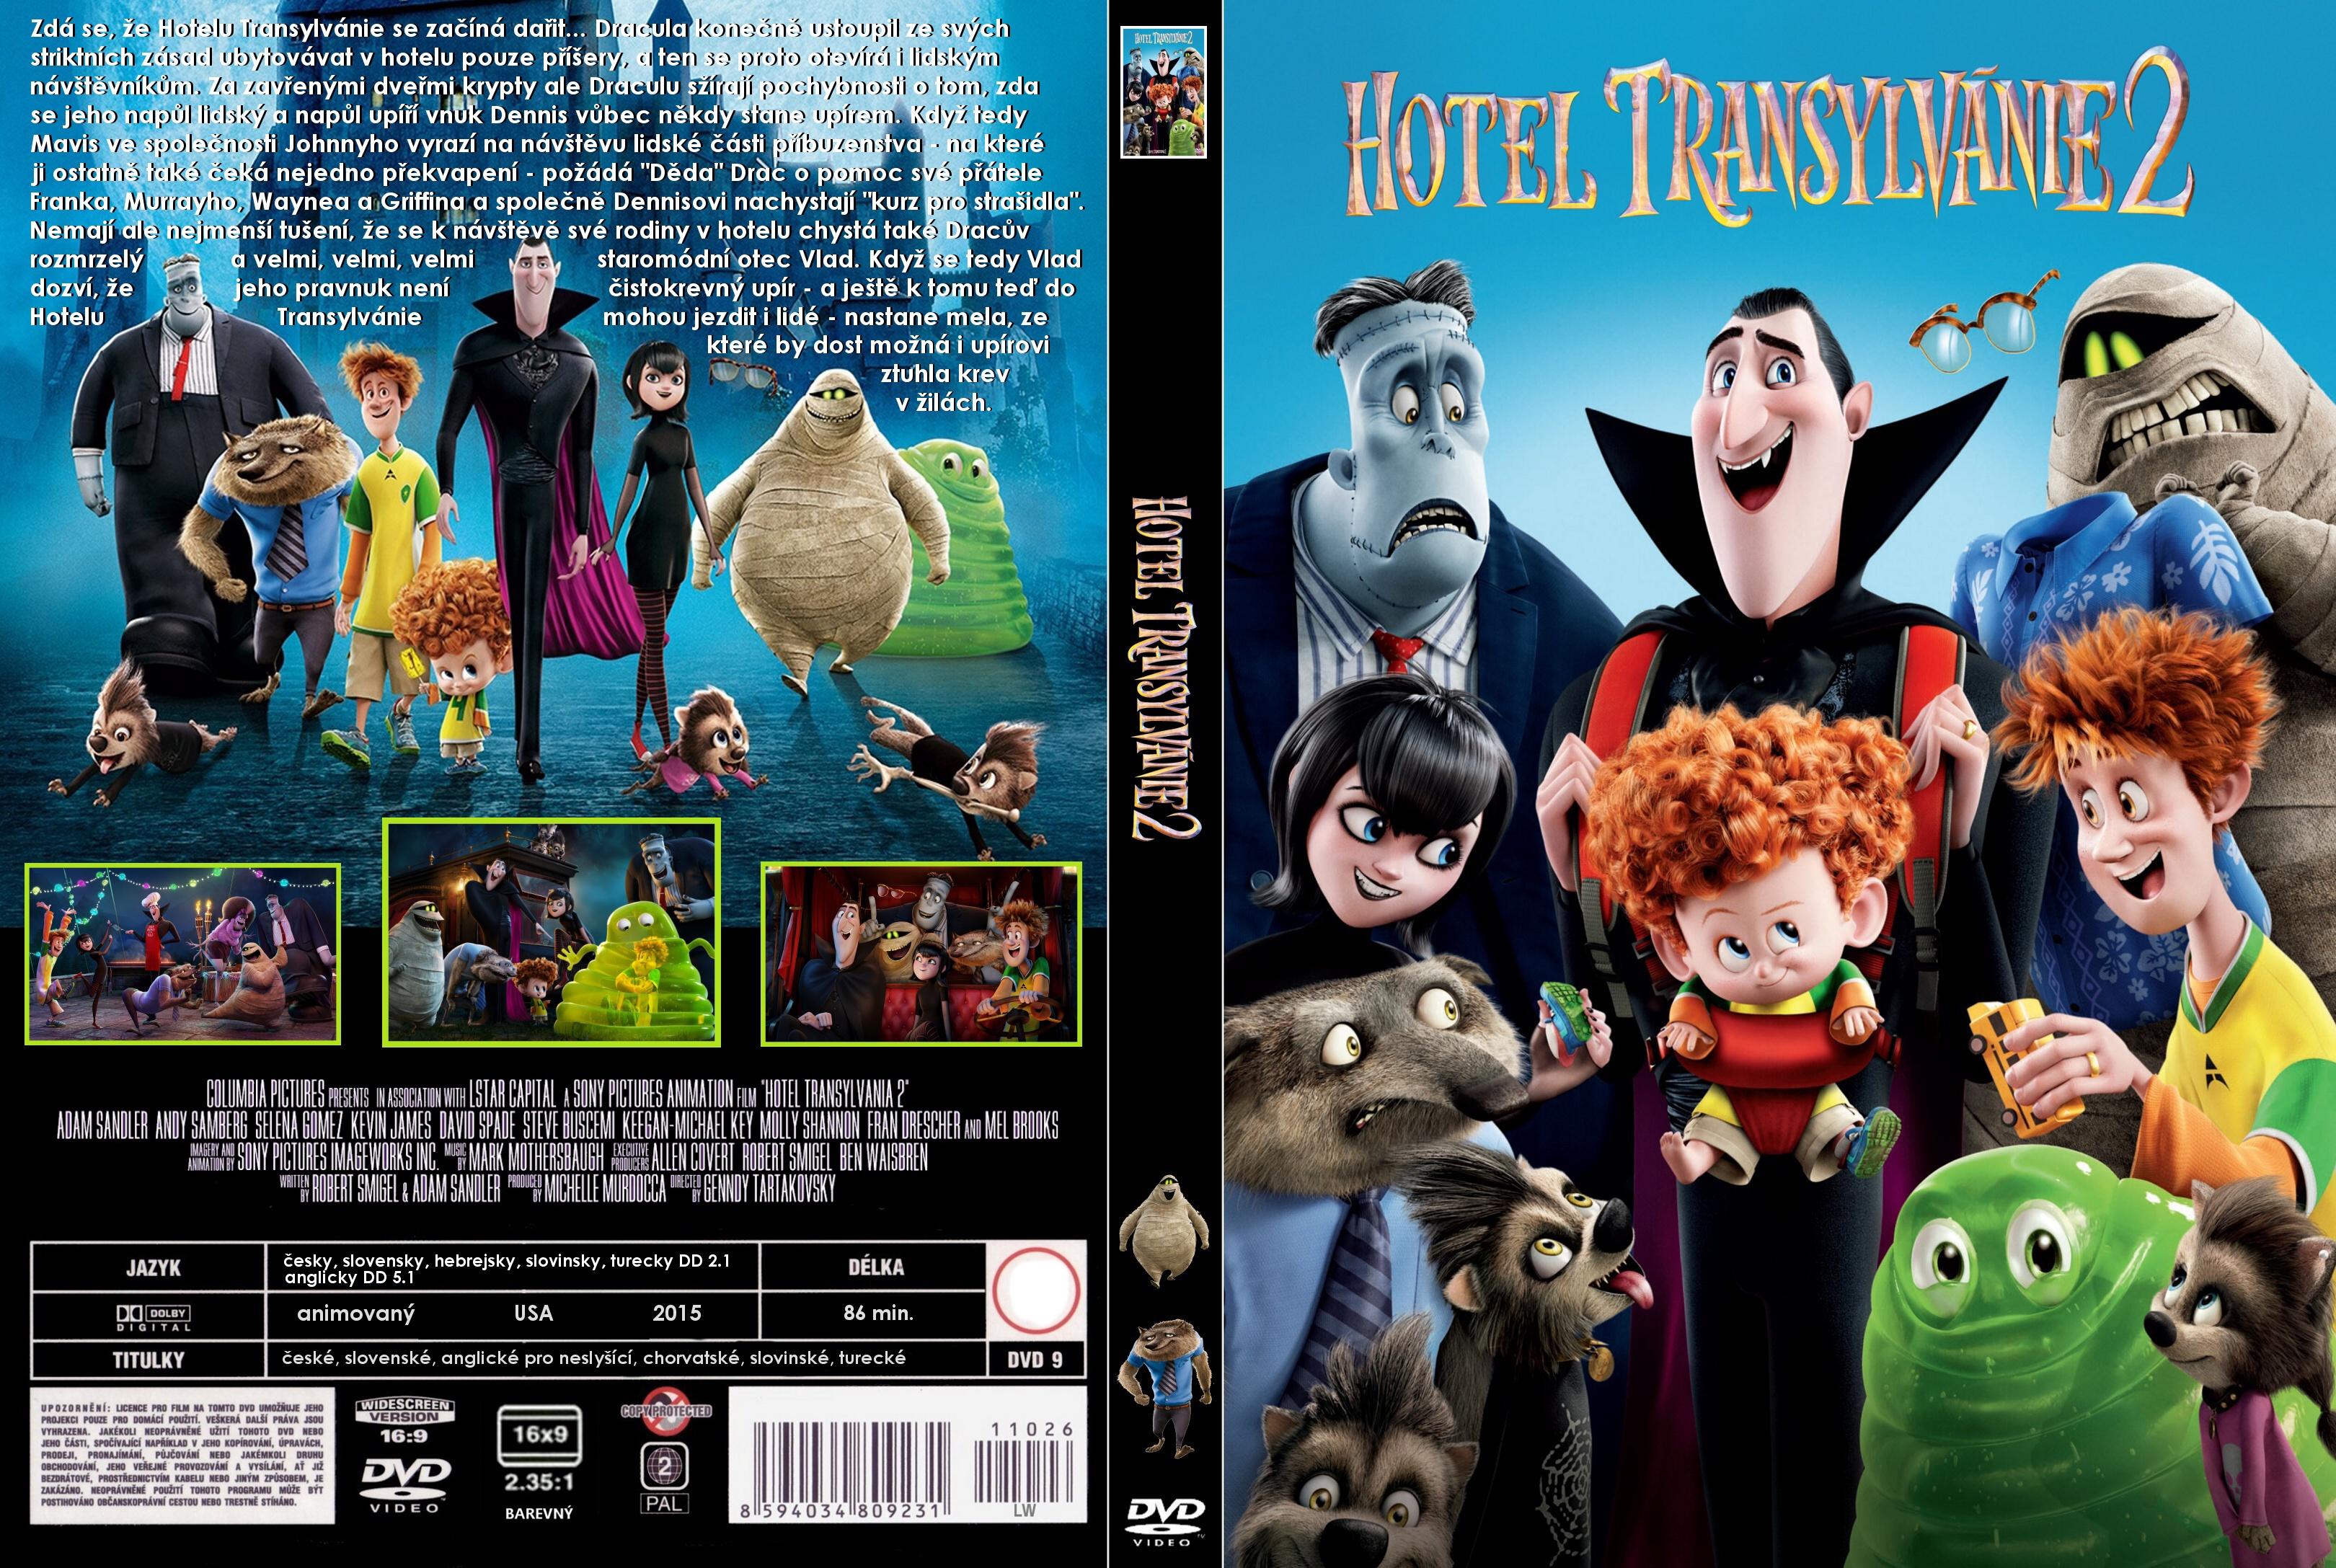 Covers Box Sk Hotel Transylvania 2 2015 High Quality Dvd Blueray Movie